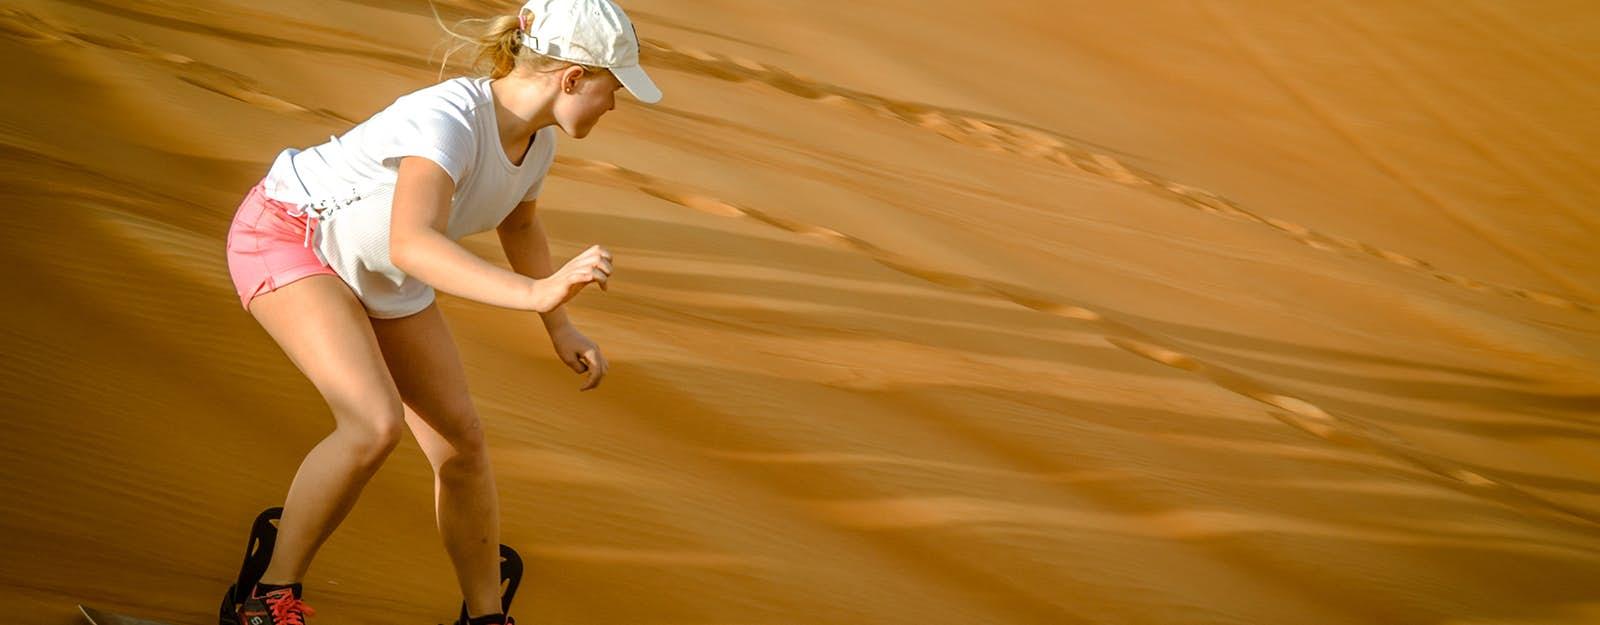 sandboarding dubai